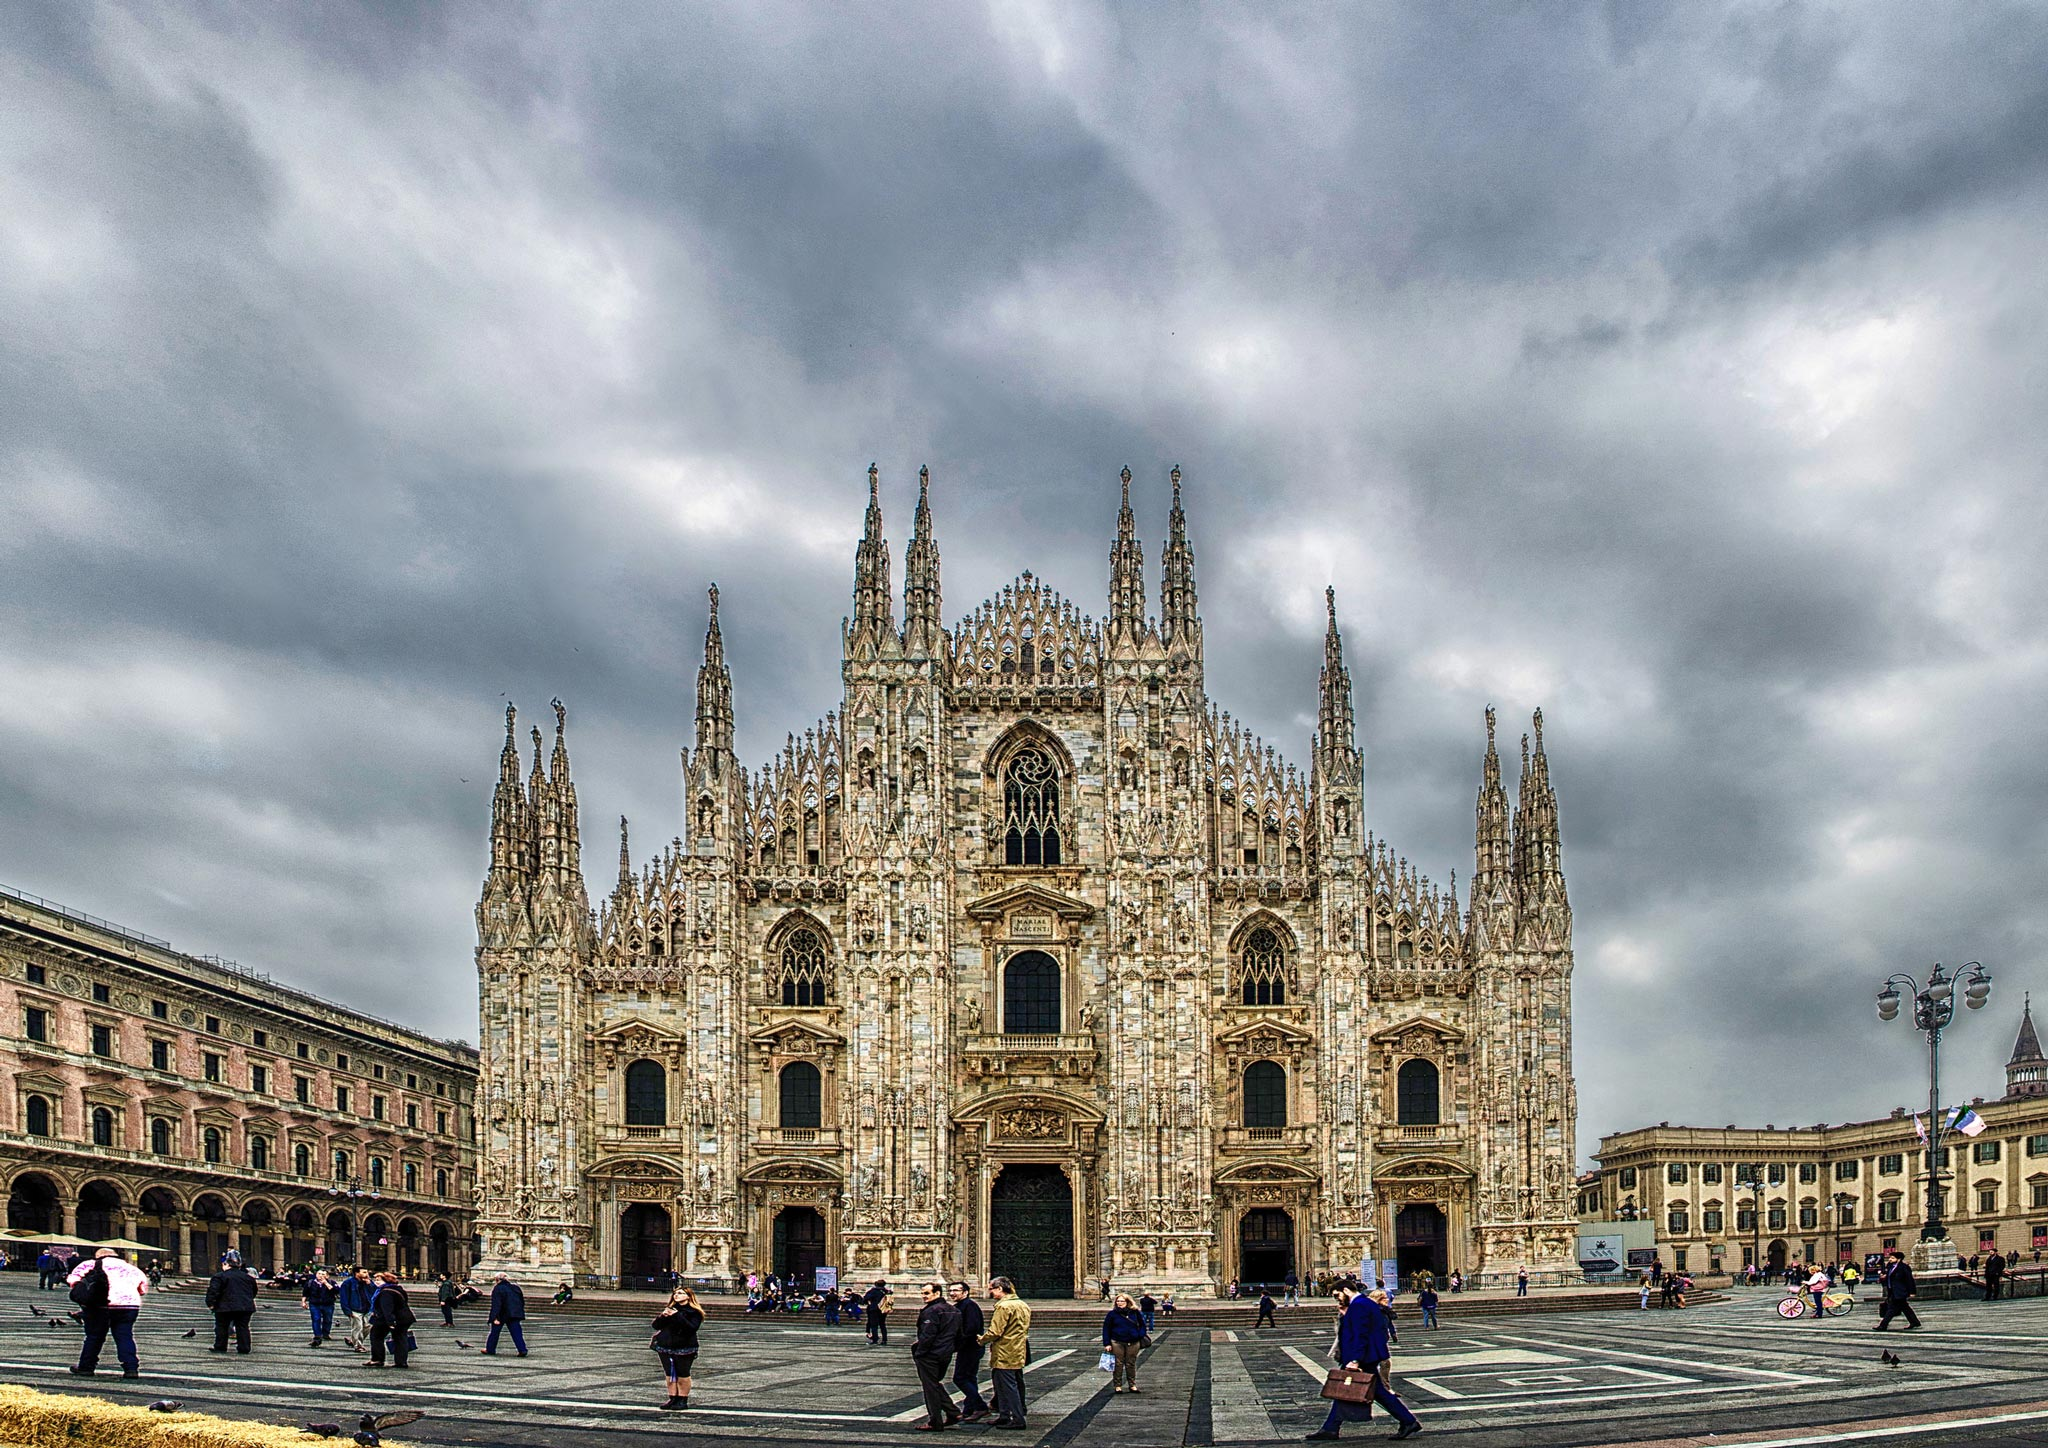 Paesaggi-Italia - Duomo - Duomo-di-Milano-Fotografo - Duomo-di-Milano-Fotografo